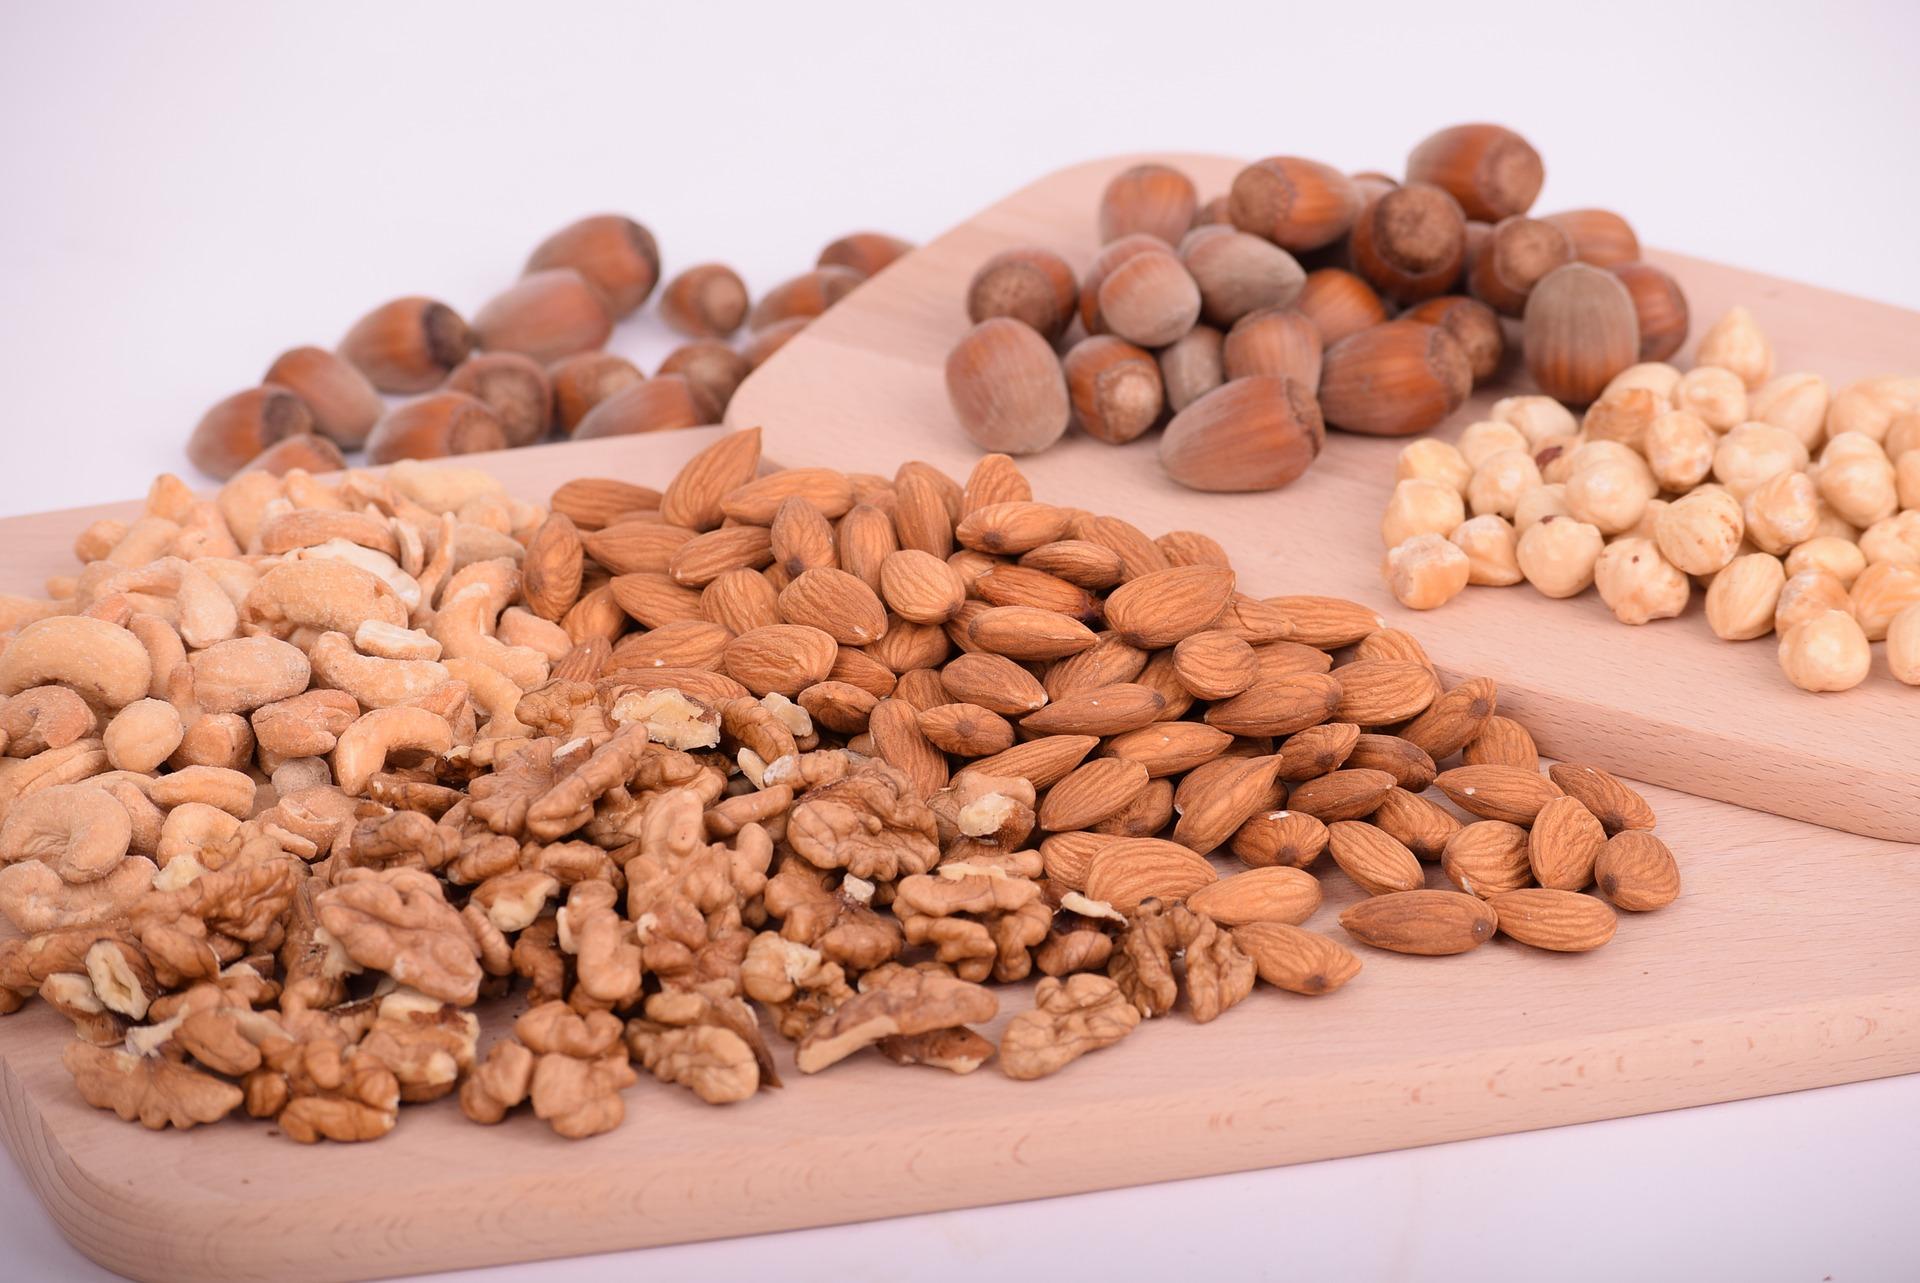 nuts-3248743_1920